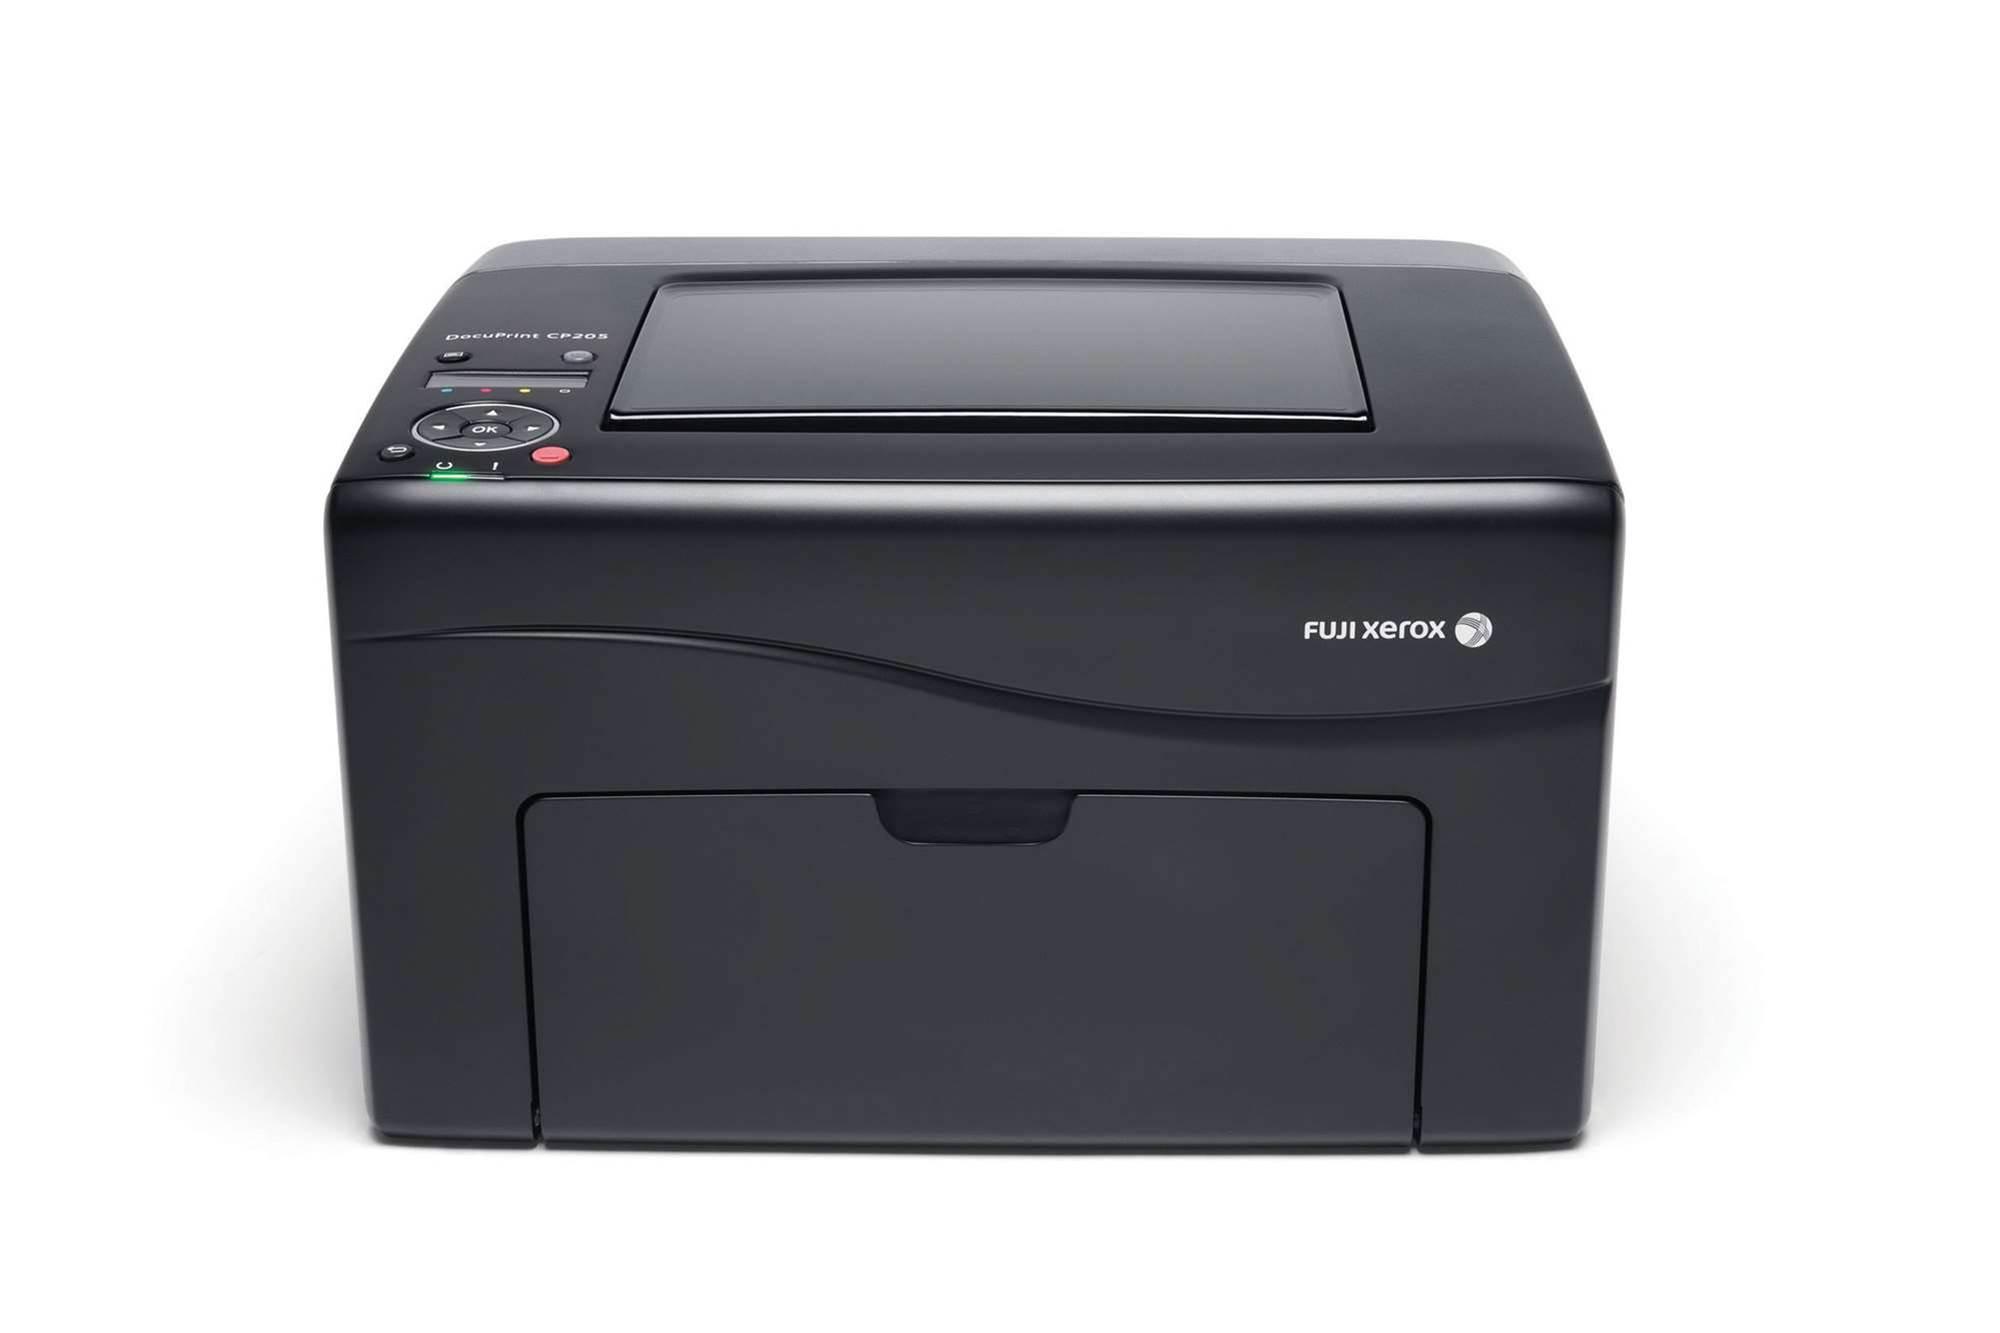 Product brief: Fuji-Xerox Docuprint CP205